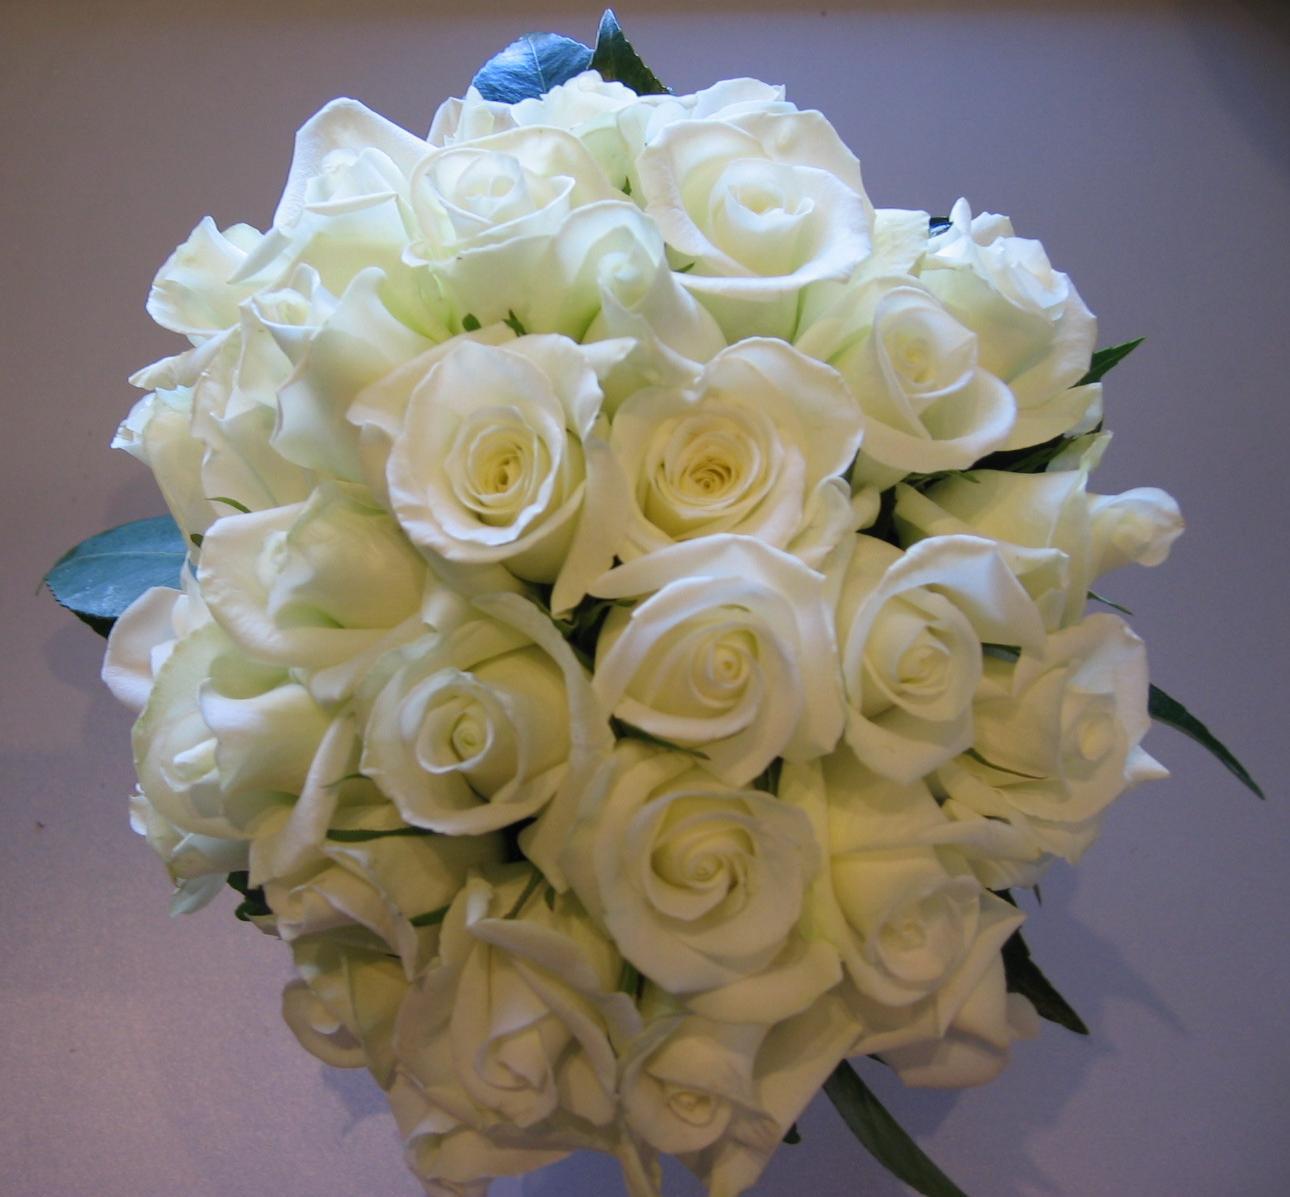 White Rose Flower Bouquet: Yellow Wallpaper: White Roses